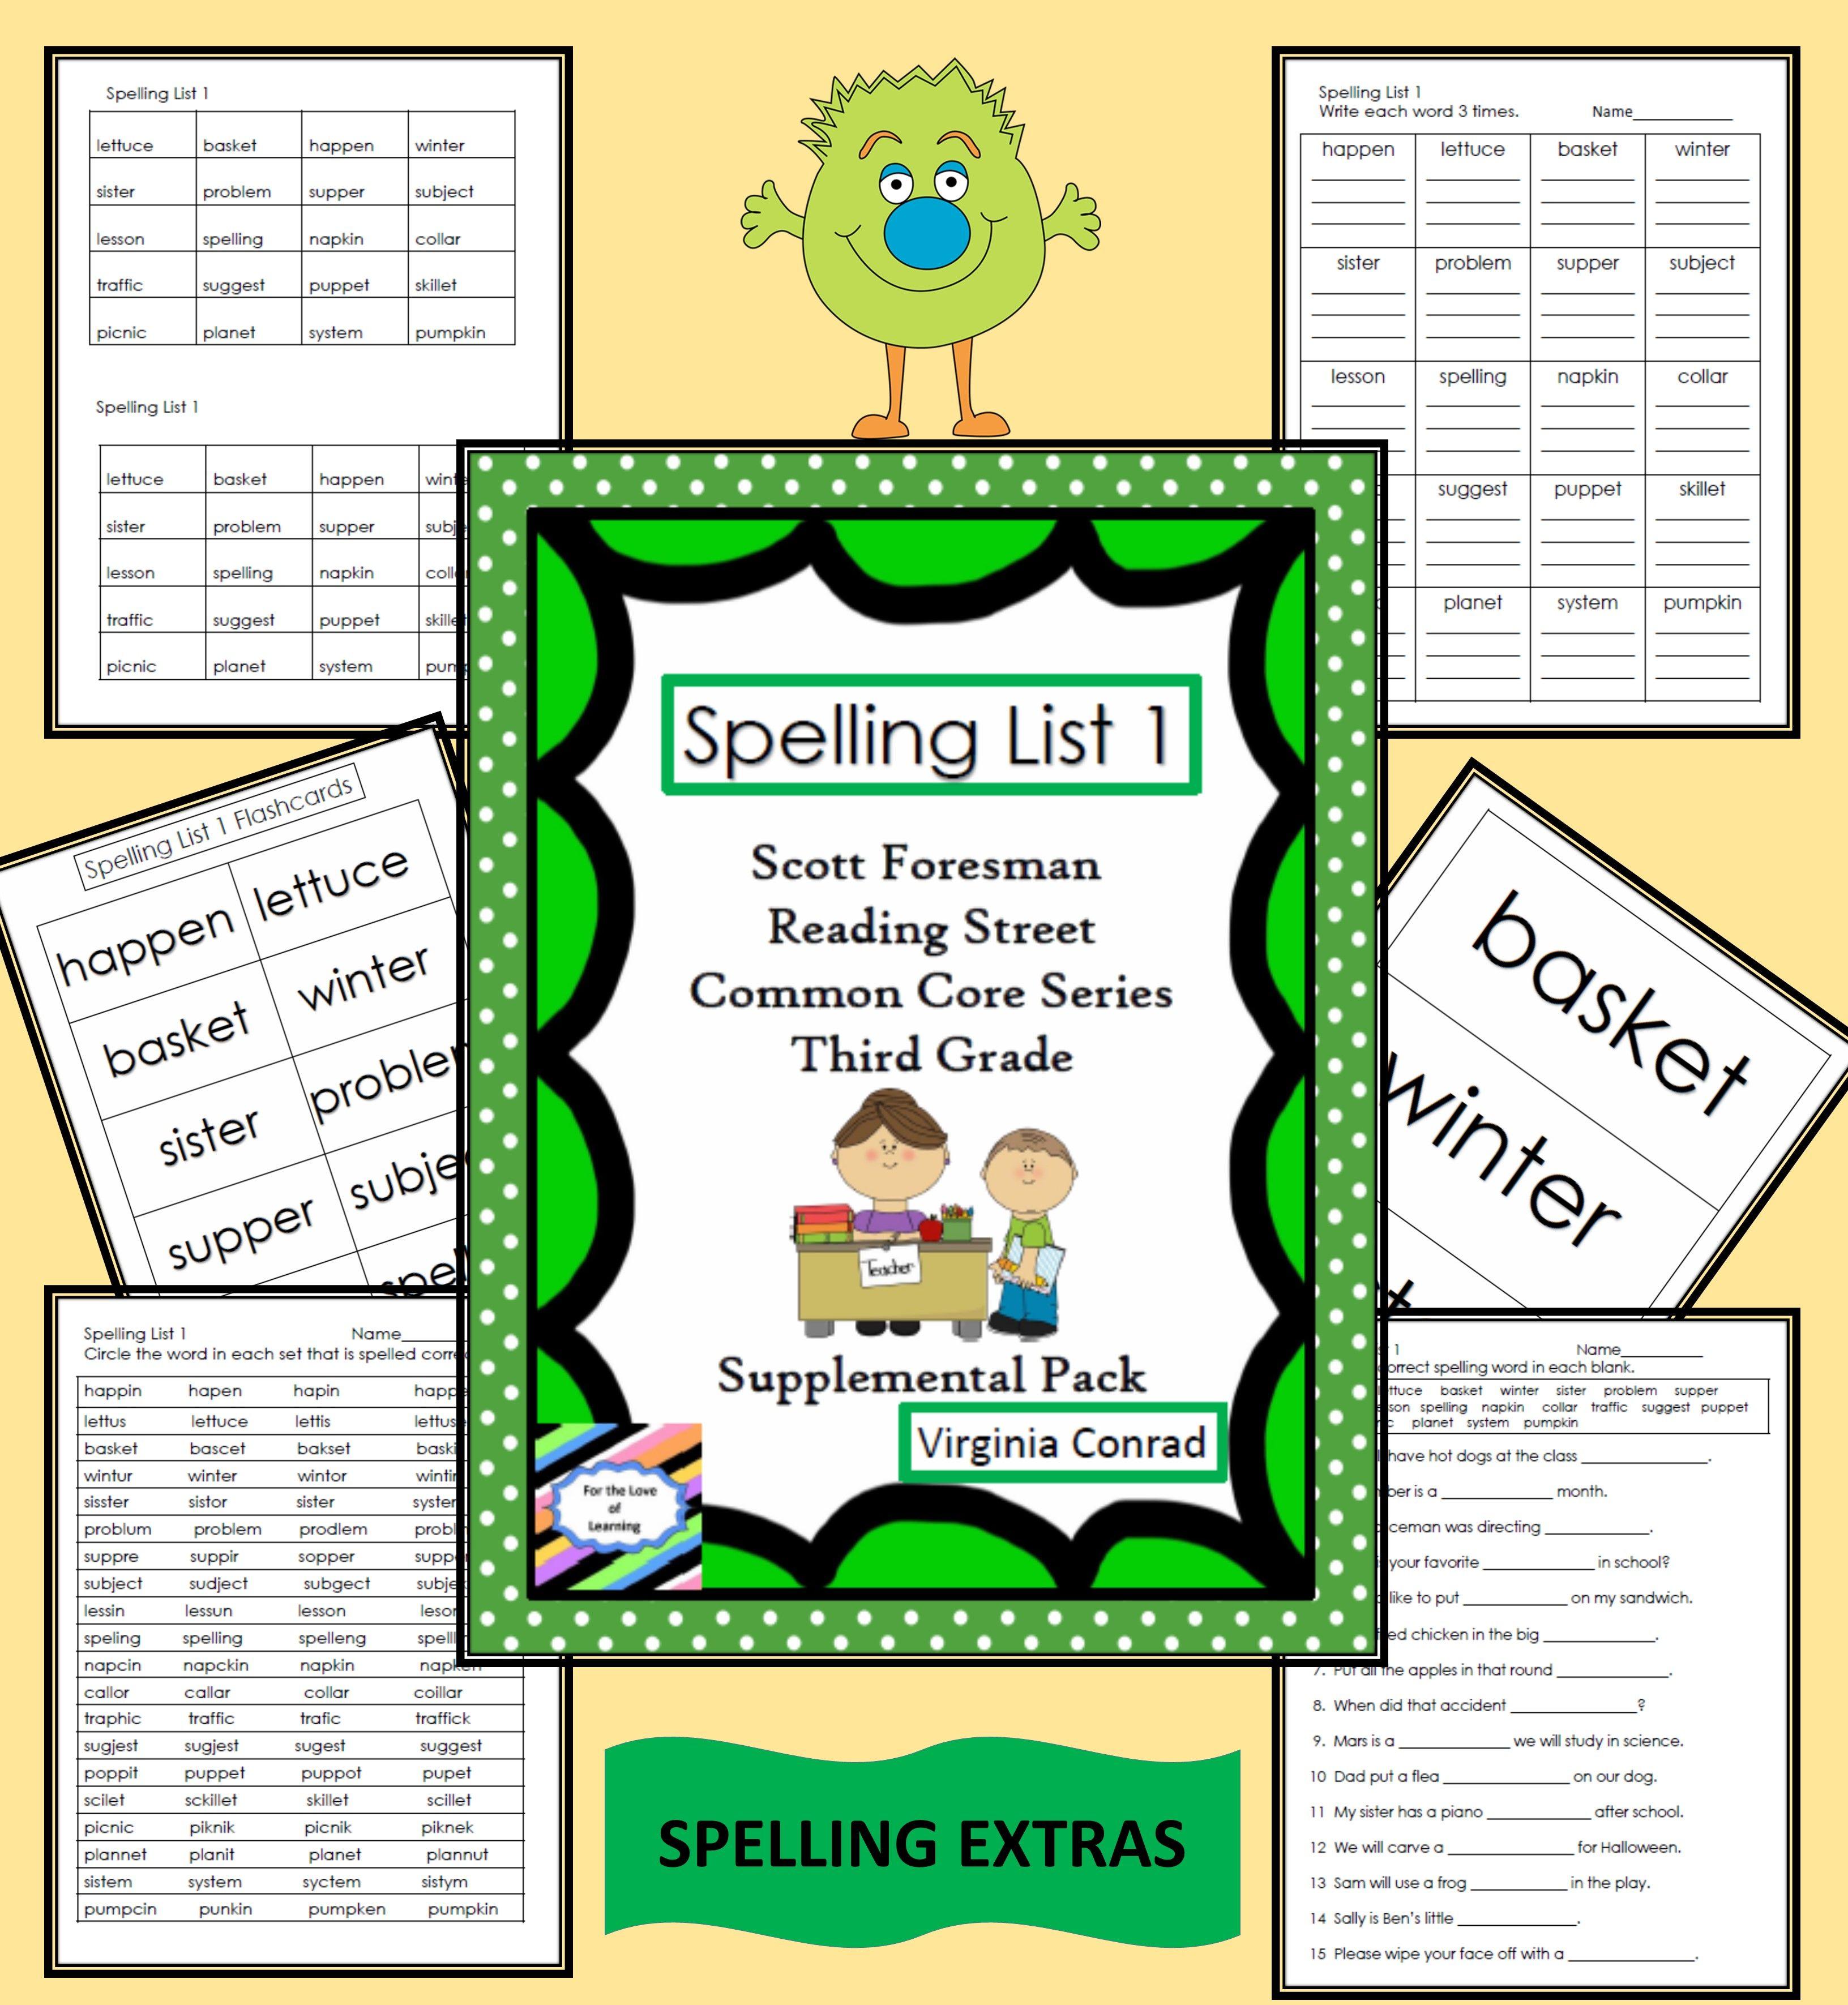 Spelling Packet For List 1 Scott Foresman Third Grade